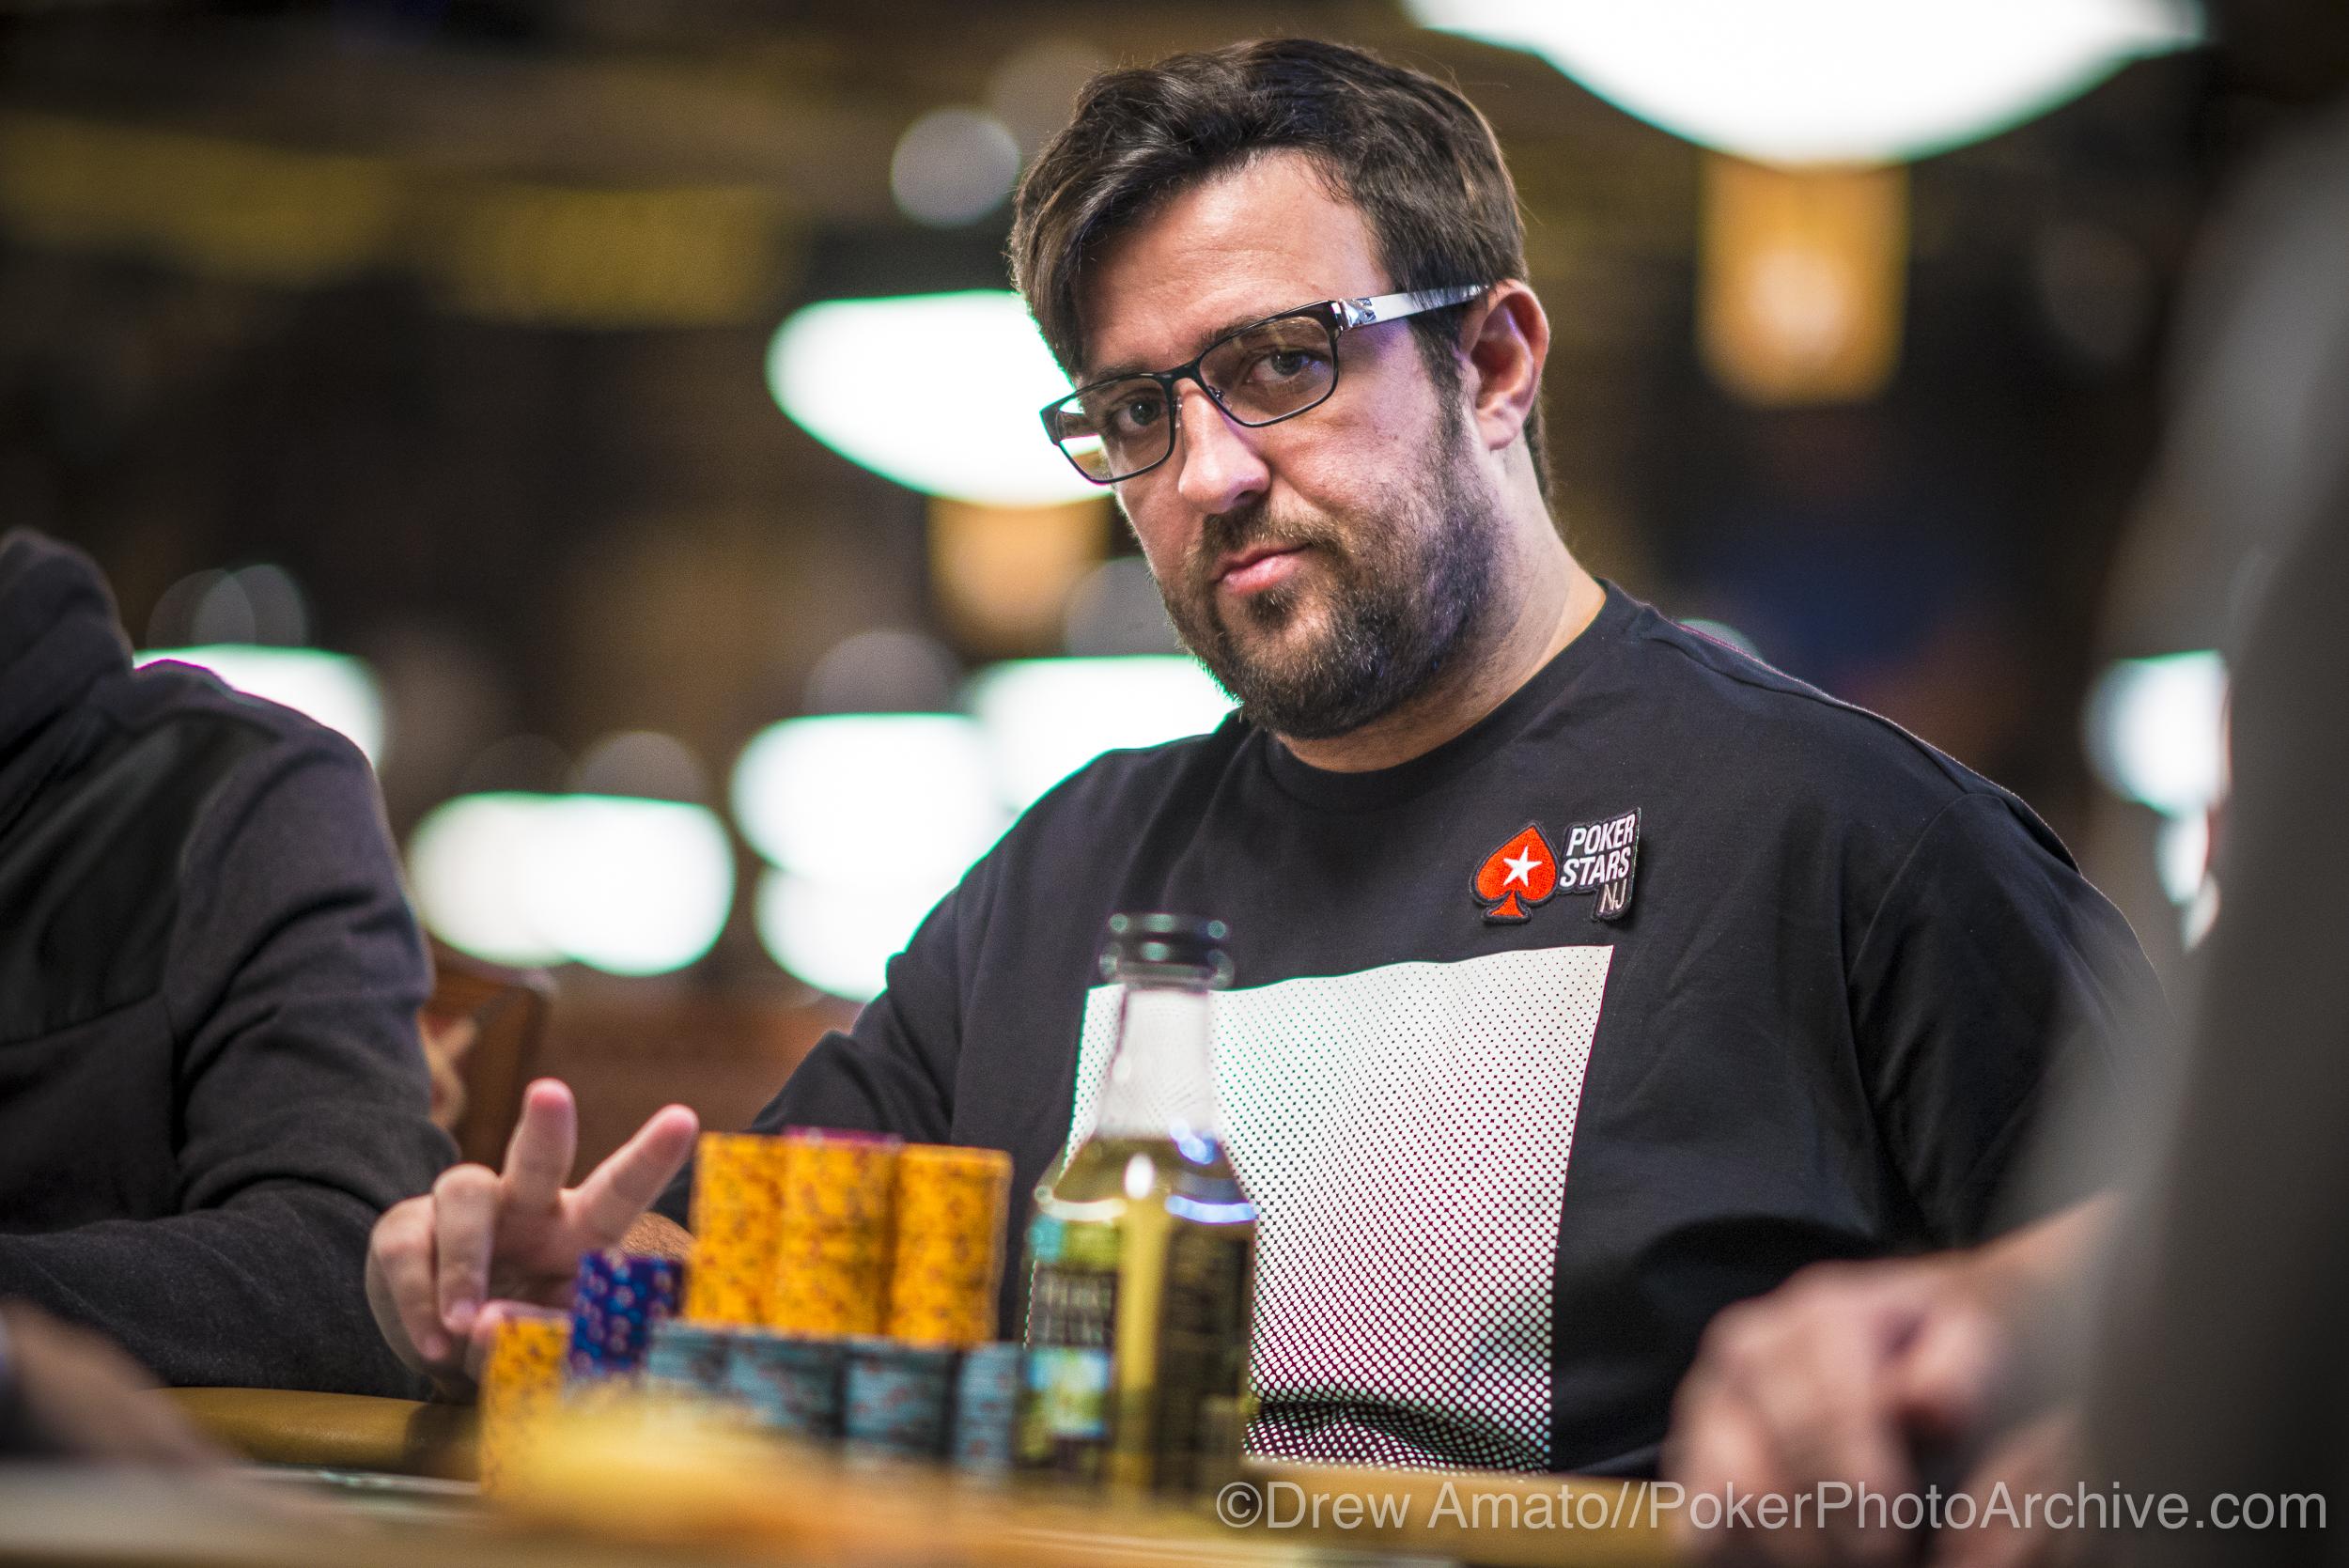 Andre Akkari_2017 WSOP_EV59_Day 1_Amato_DA65358.jpg